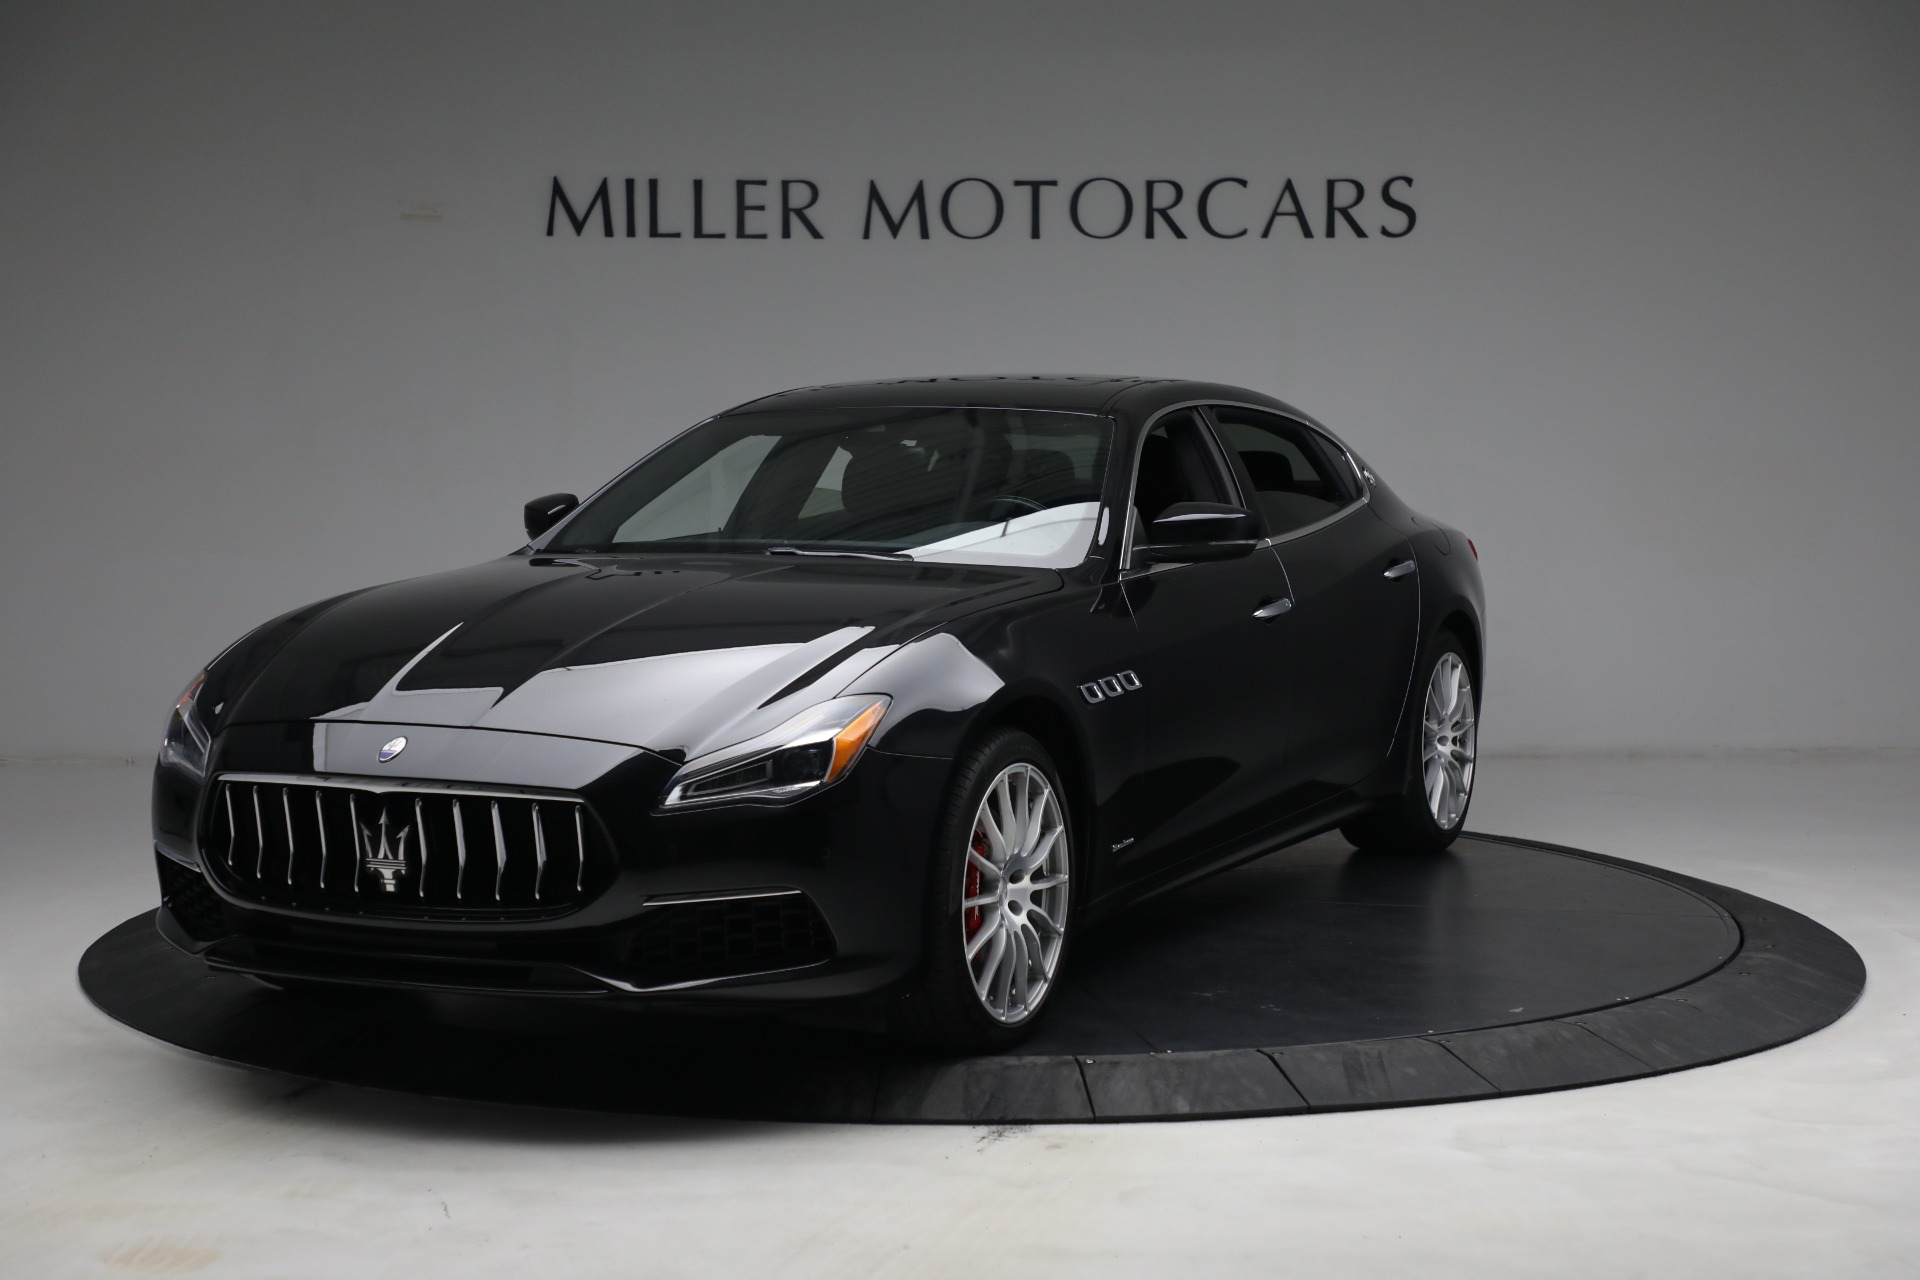 Used 2019 Maserati Quattroporte S Q4 GranLusso for sale $68,900 at Bentley Greenwich in Greenwich CT 06830 1